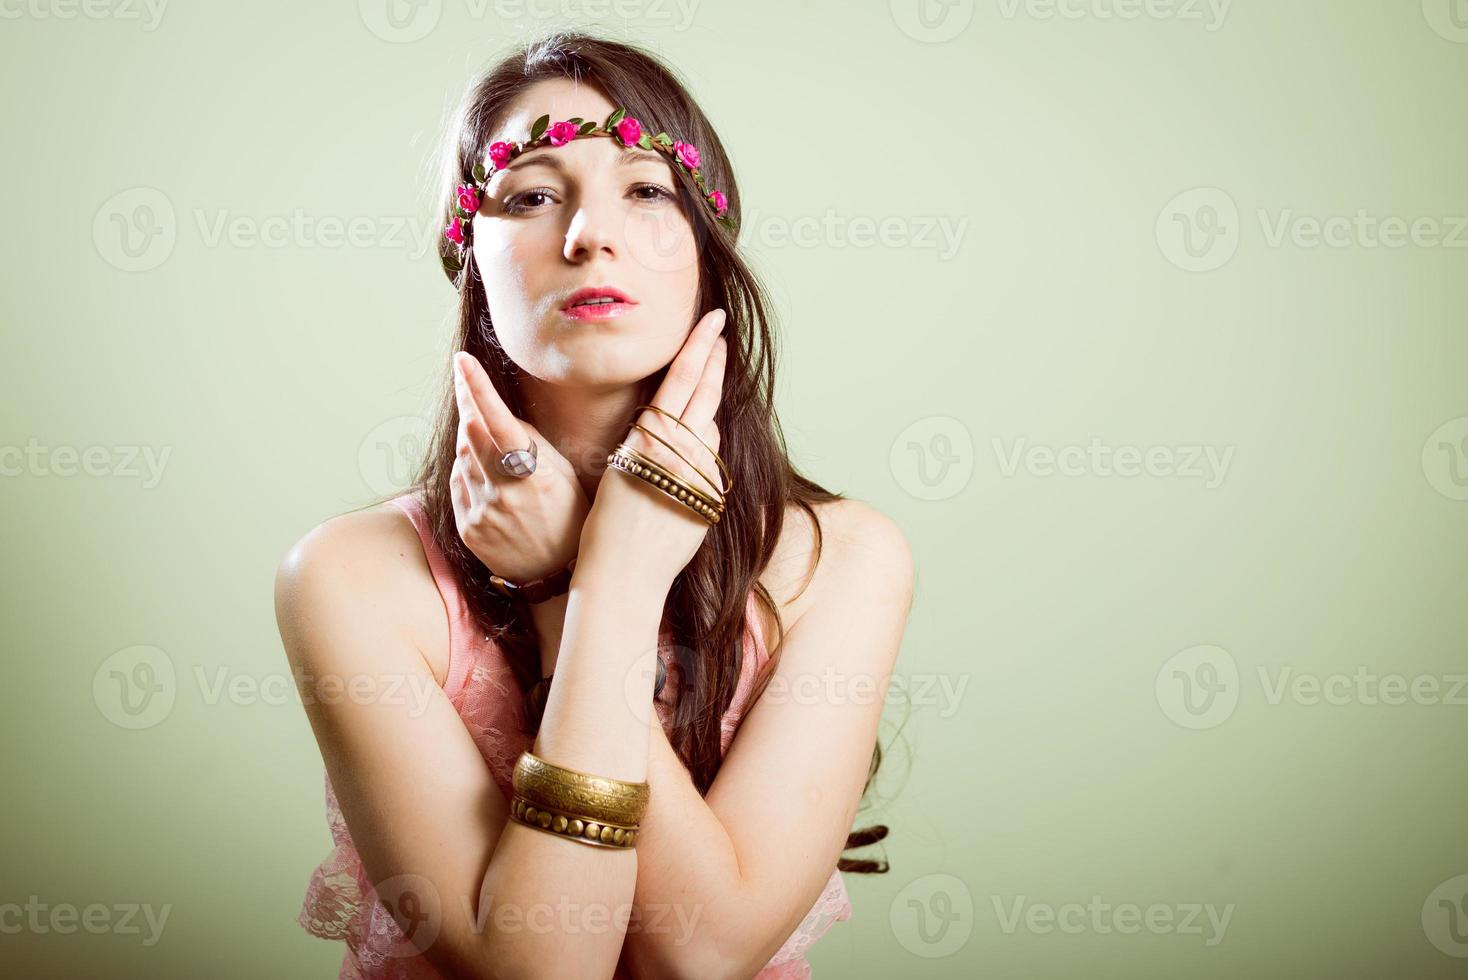 Studioporträt des Hipsters, der trendigen Blumenkranz trägt foto